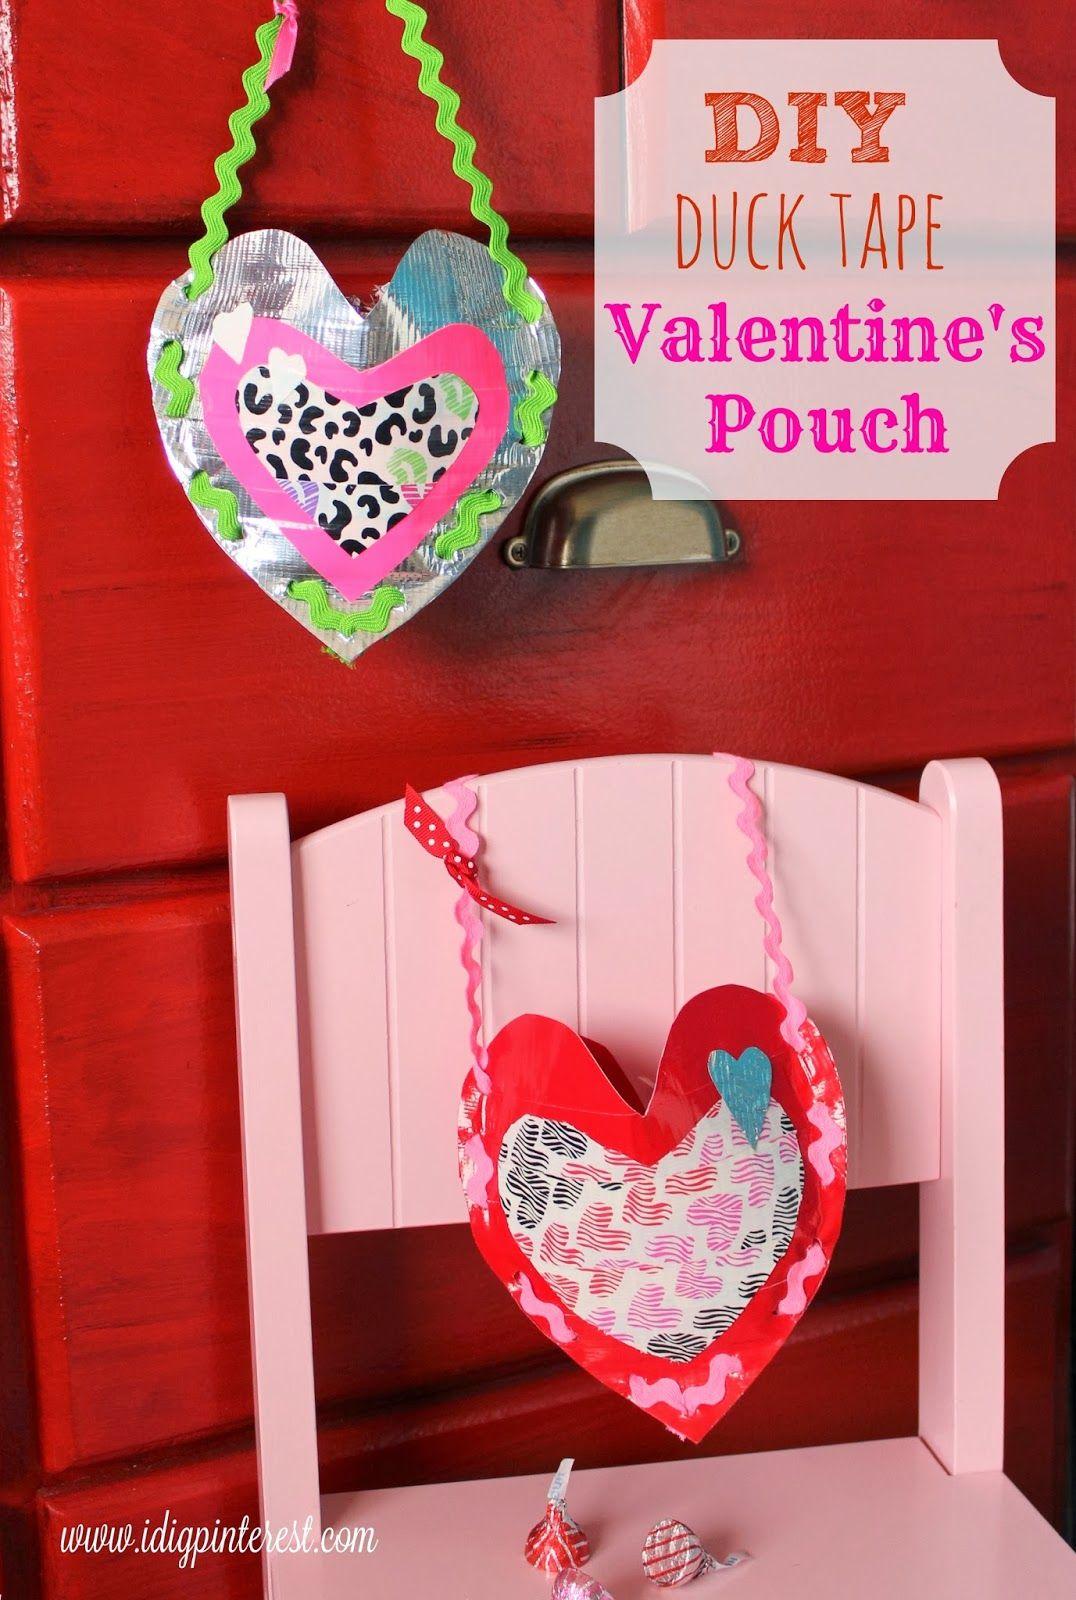 DIY Duck Tape Valentine's Treasure Pouch and Kids' Cupid Tradition #DuckValentine